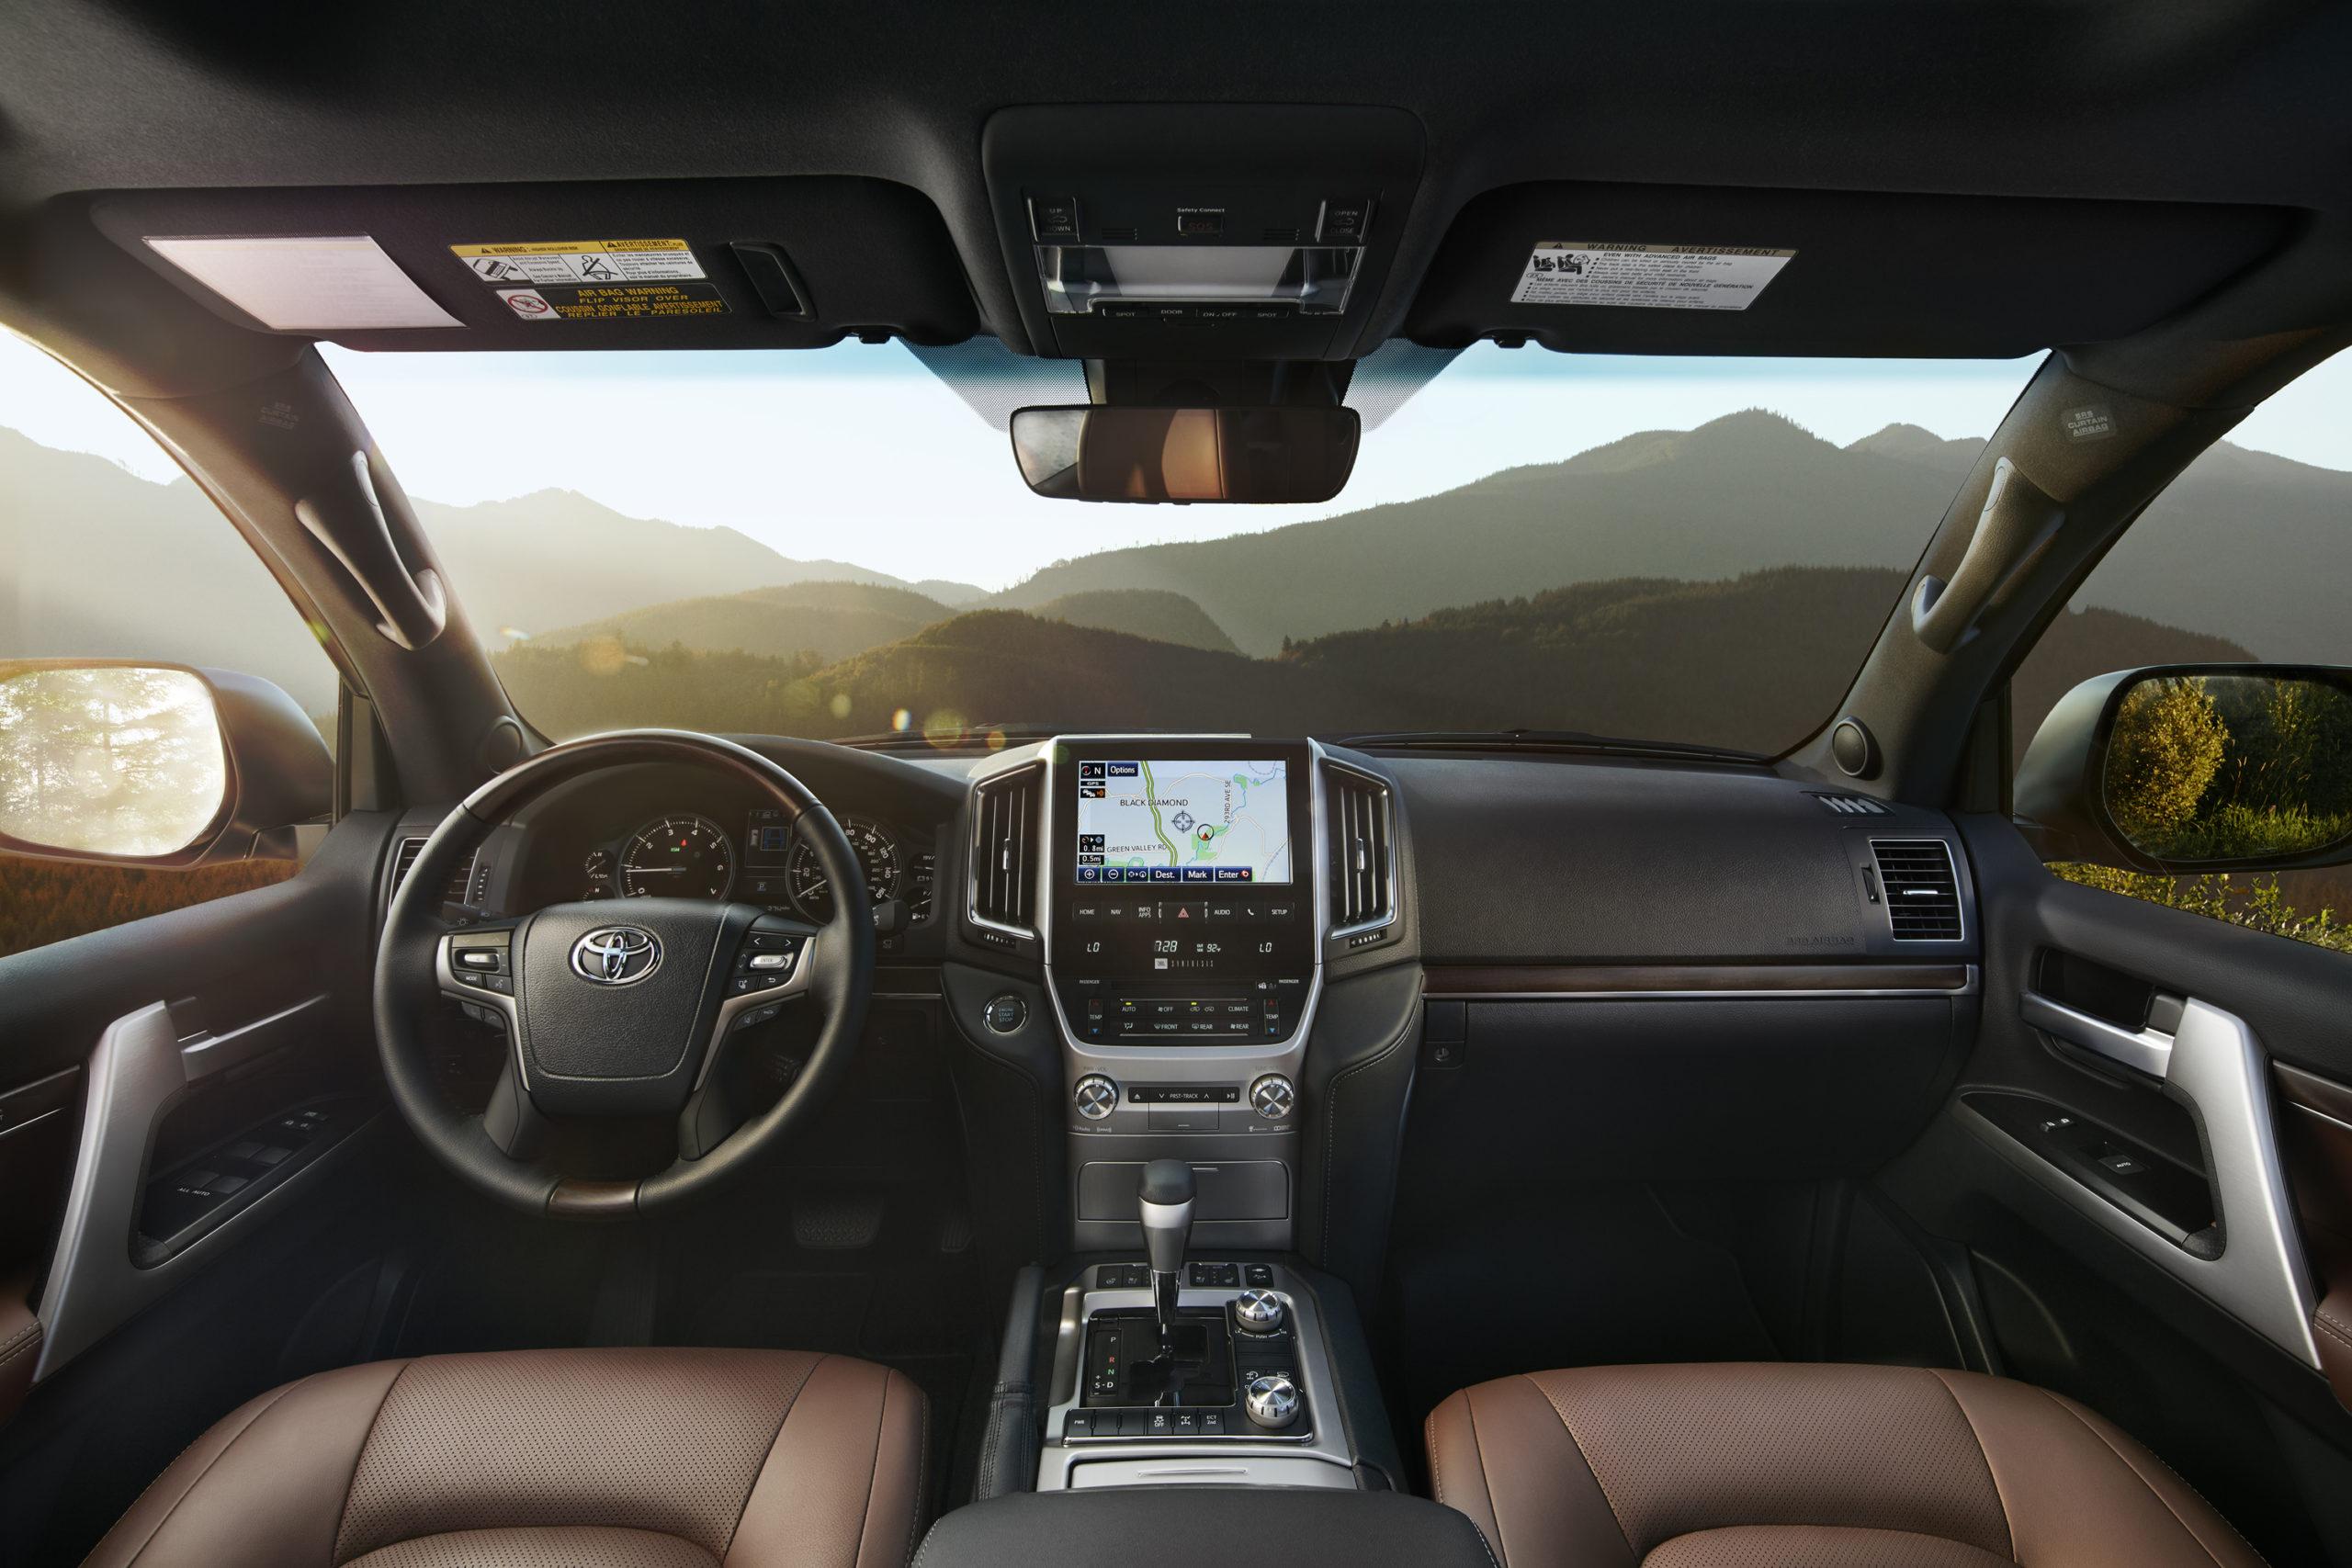 2021 Toyota Land Cruiser 200 Series interior